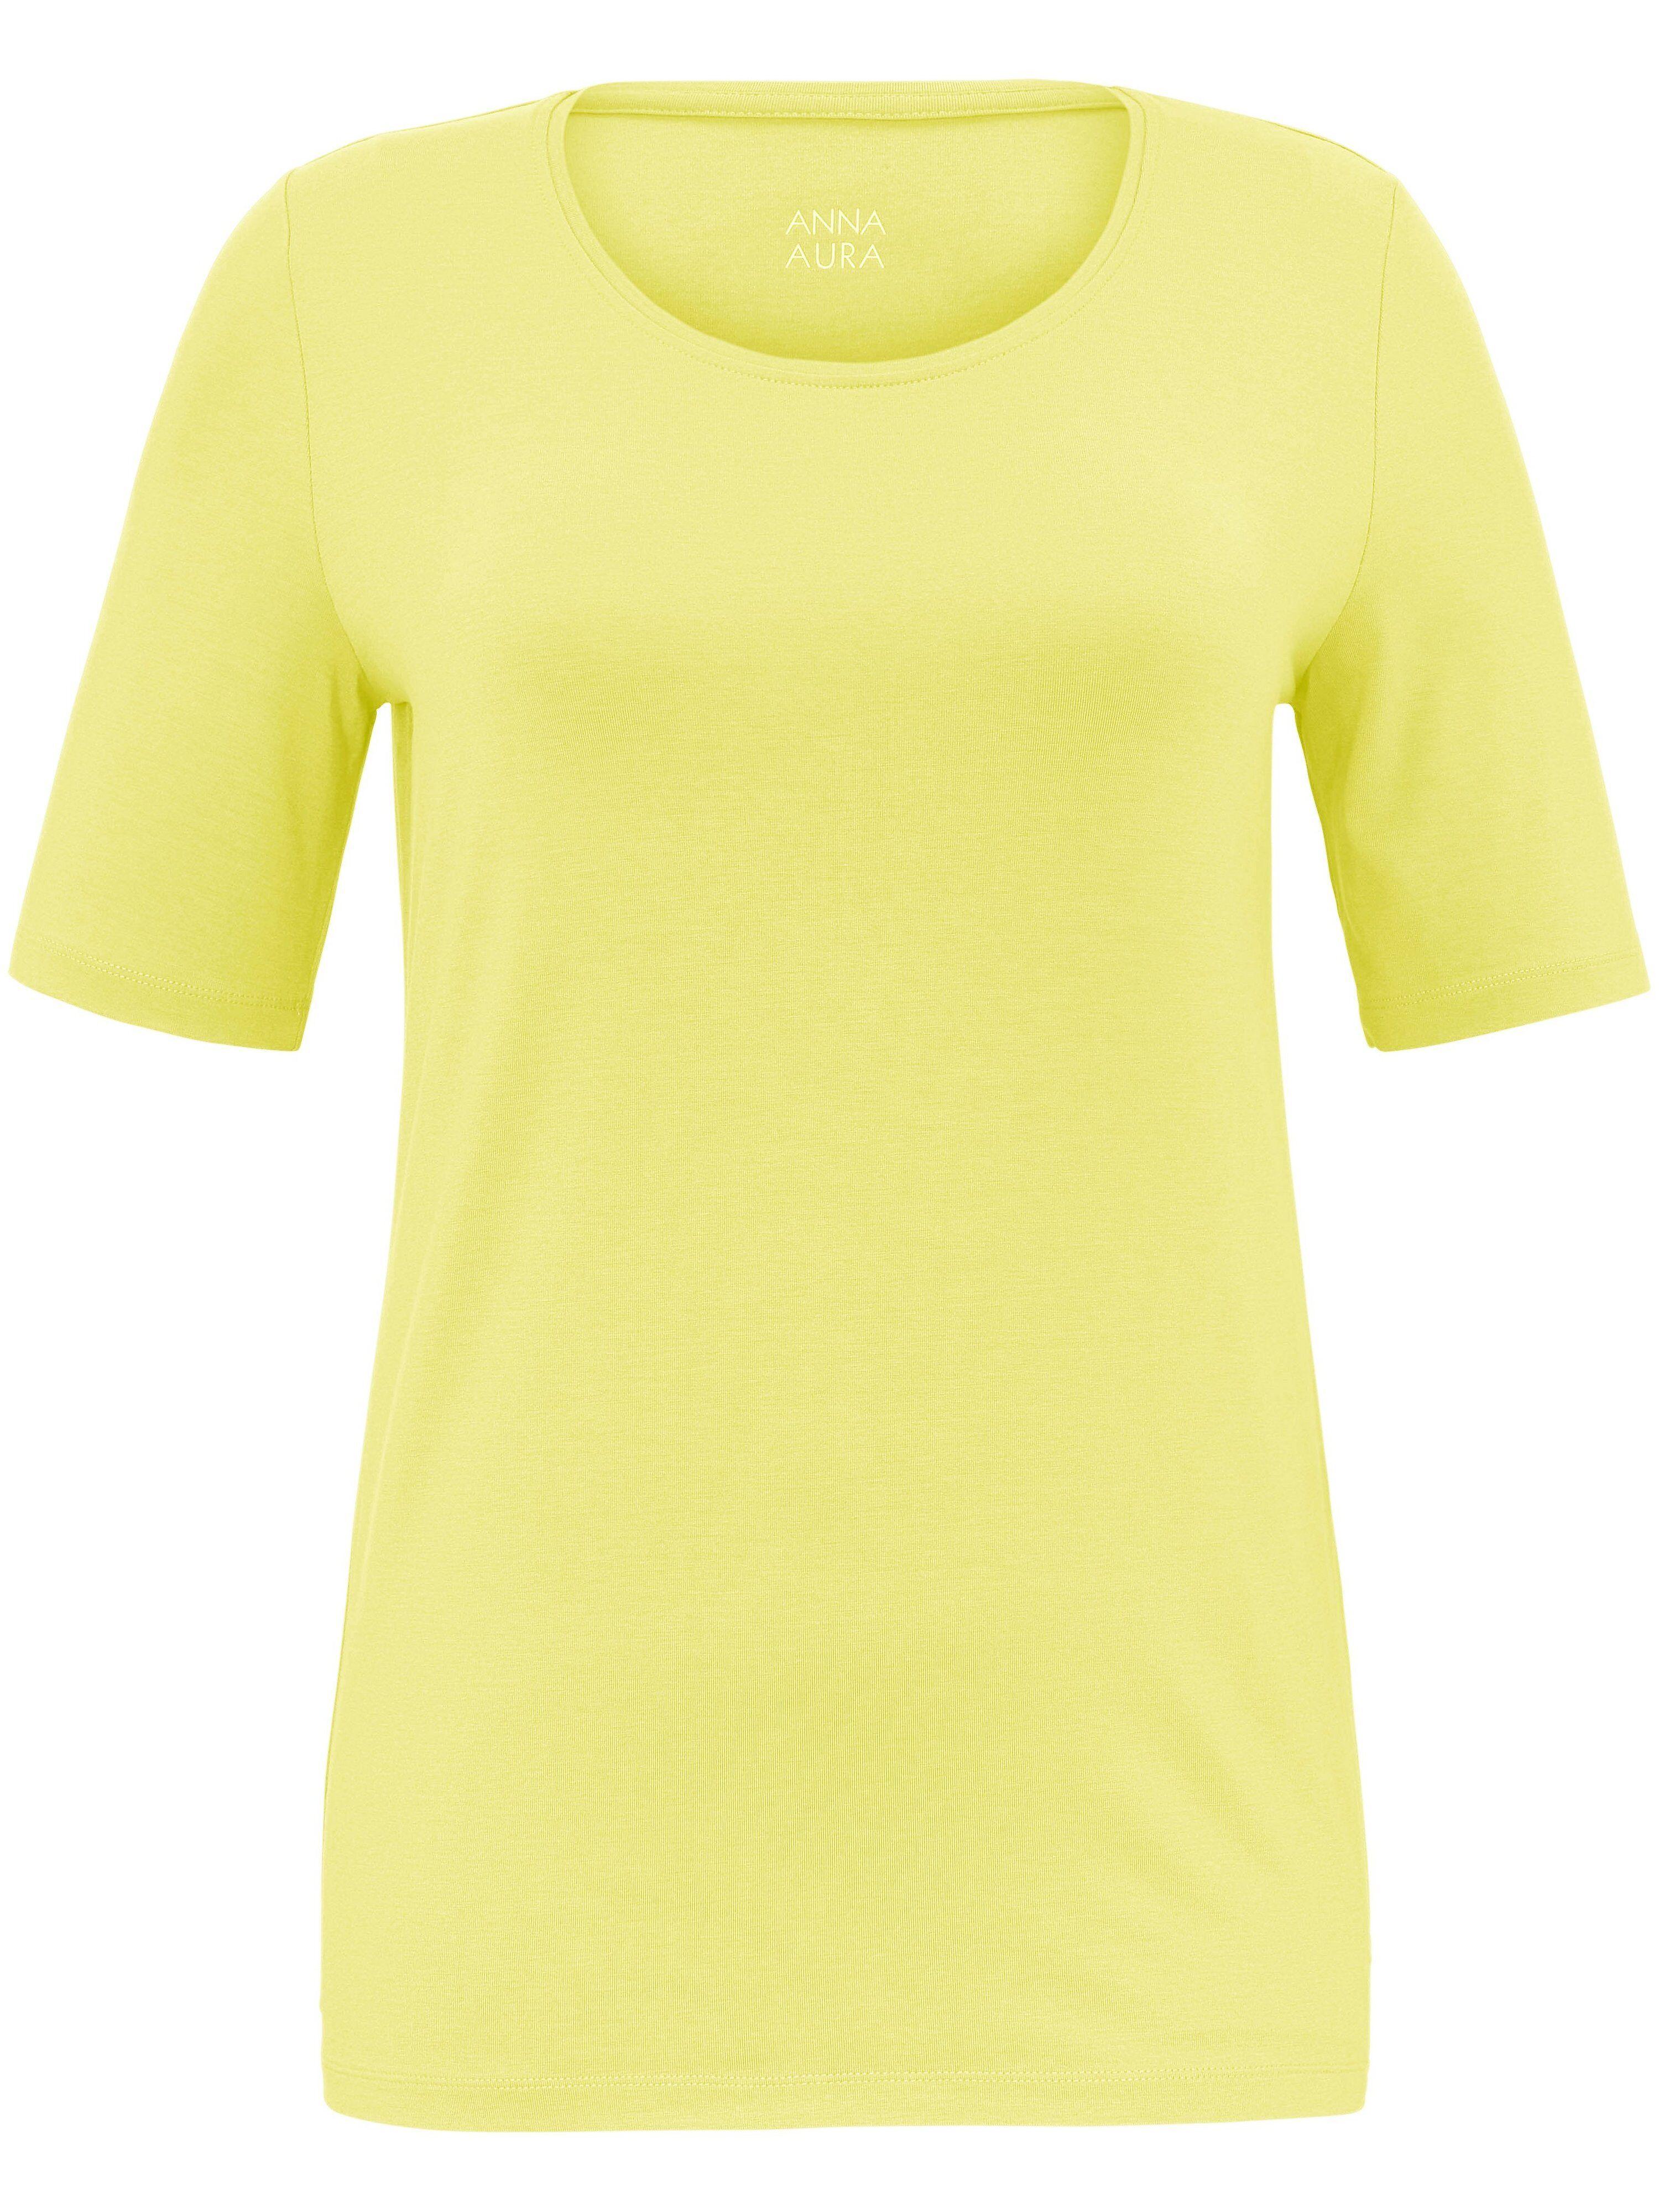 Anna Aura Le T-shirt facile d'entretien  Anna Aura jaune  - Femme - 44